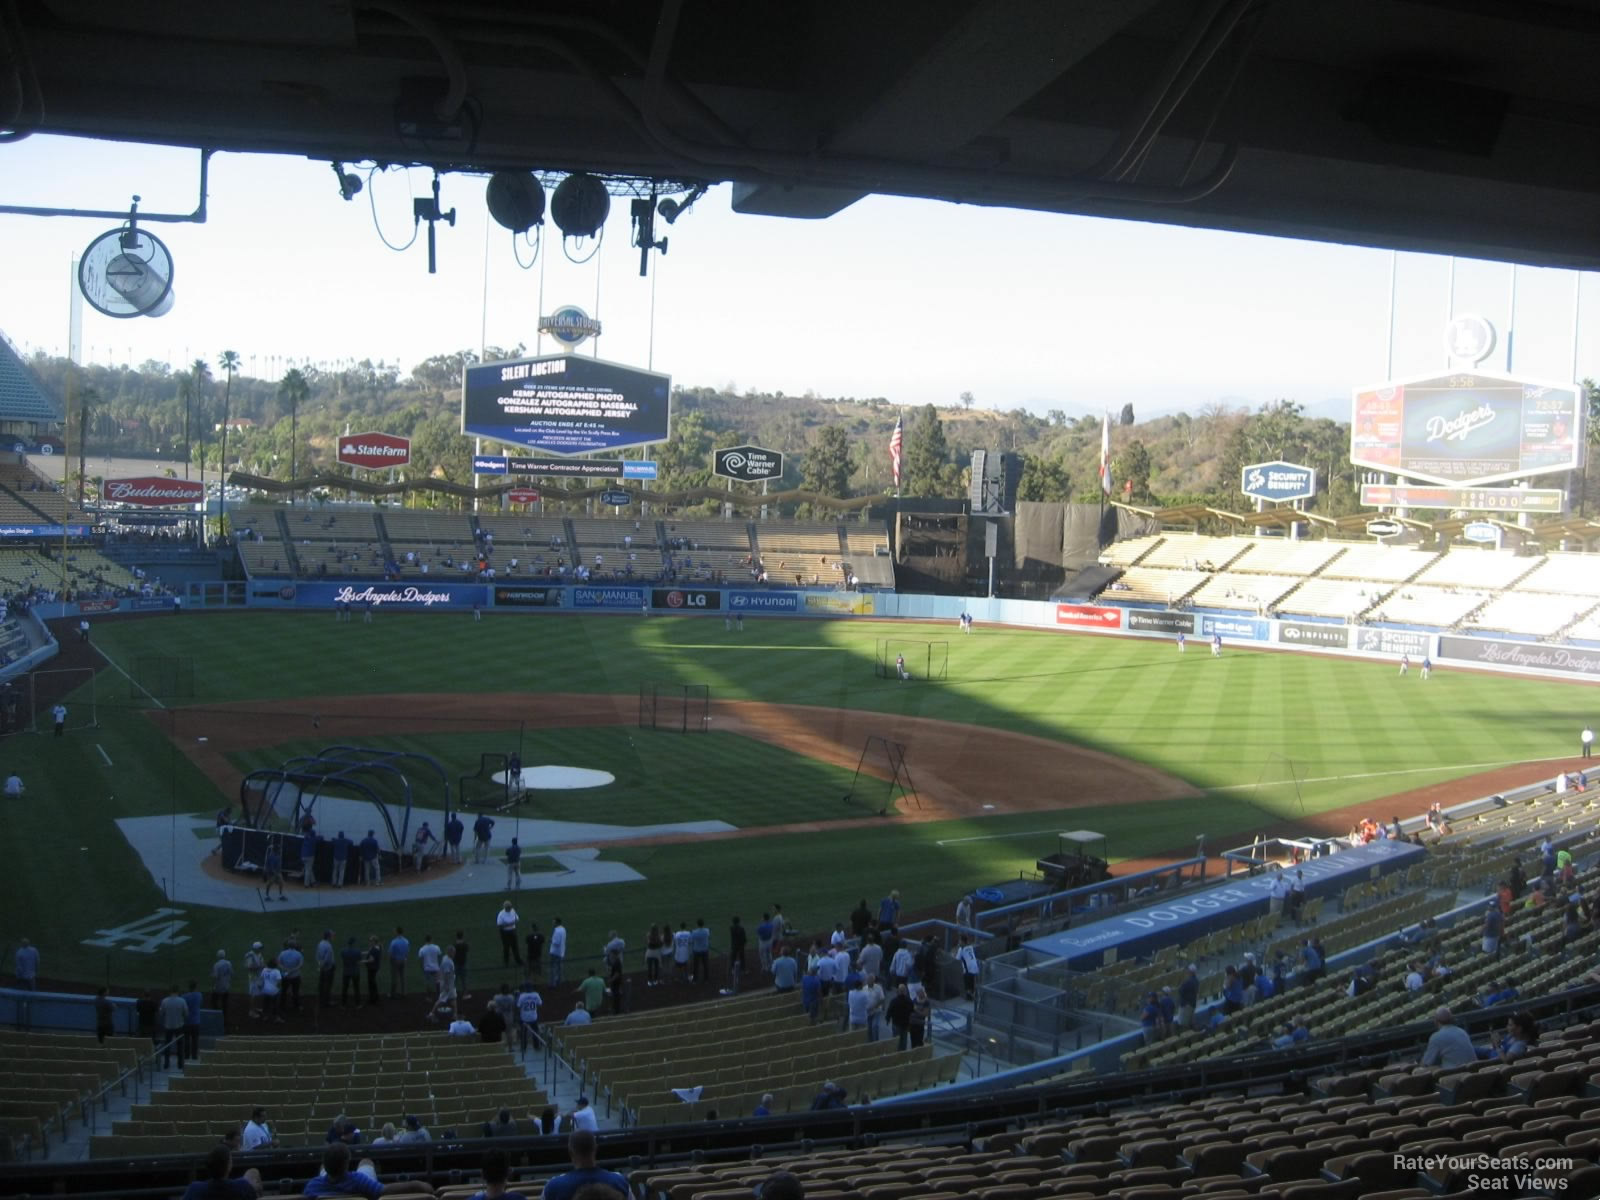 Dodger Stadium Section 114 - RateYourSeats.com